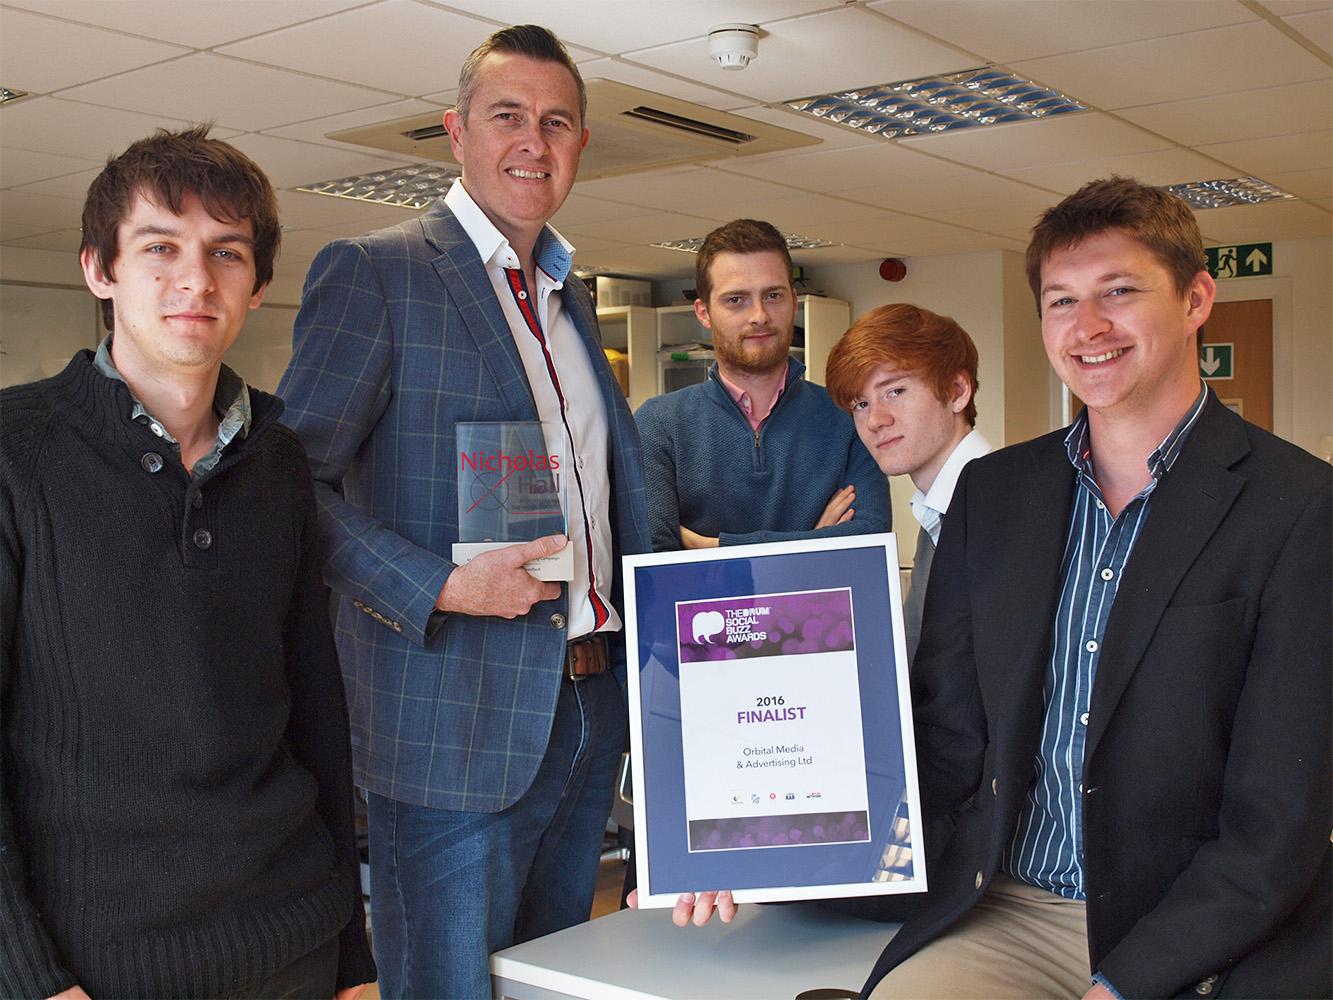 International award tops success run for local digital agency 3